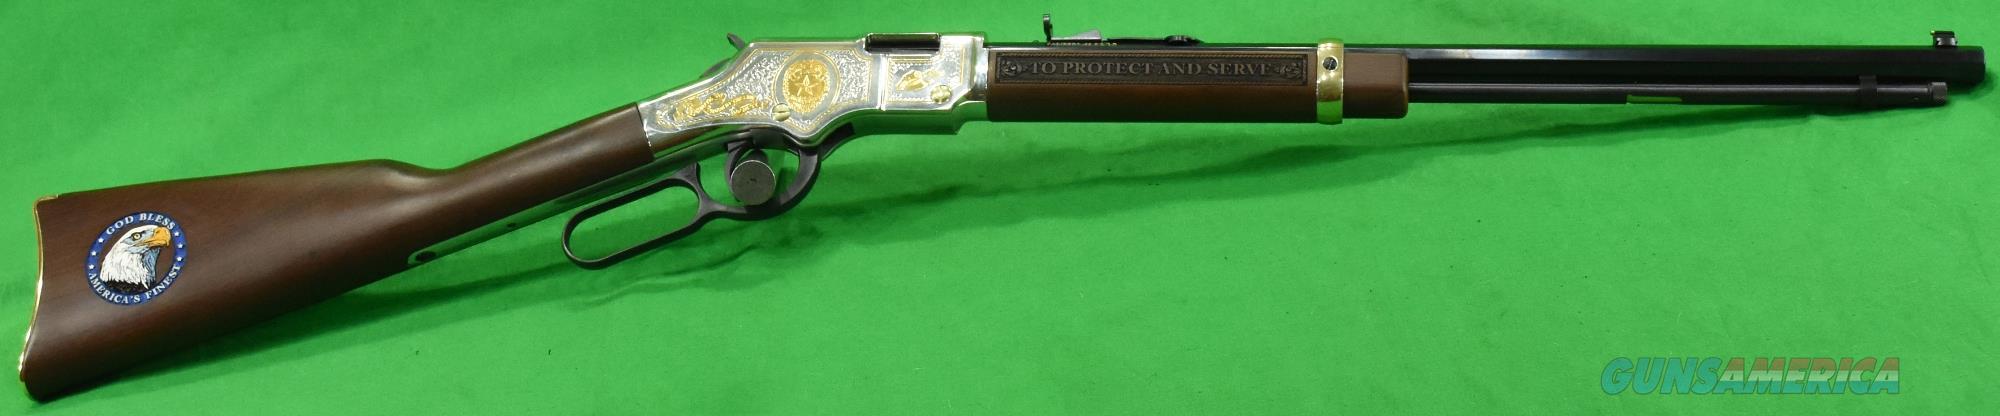 Golden Boy Law Enforcement 22Lr 20In  H004LE  Guns > Rifles > Henry Rifles - Replica